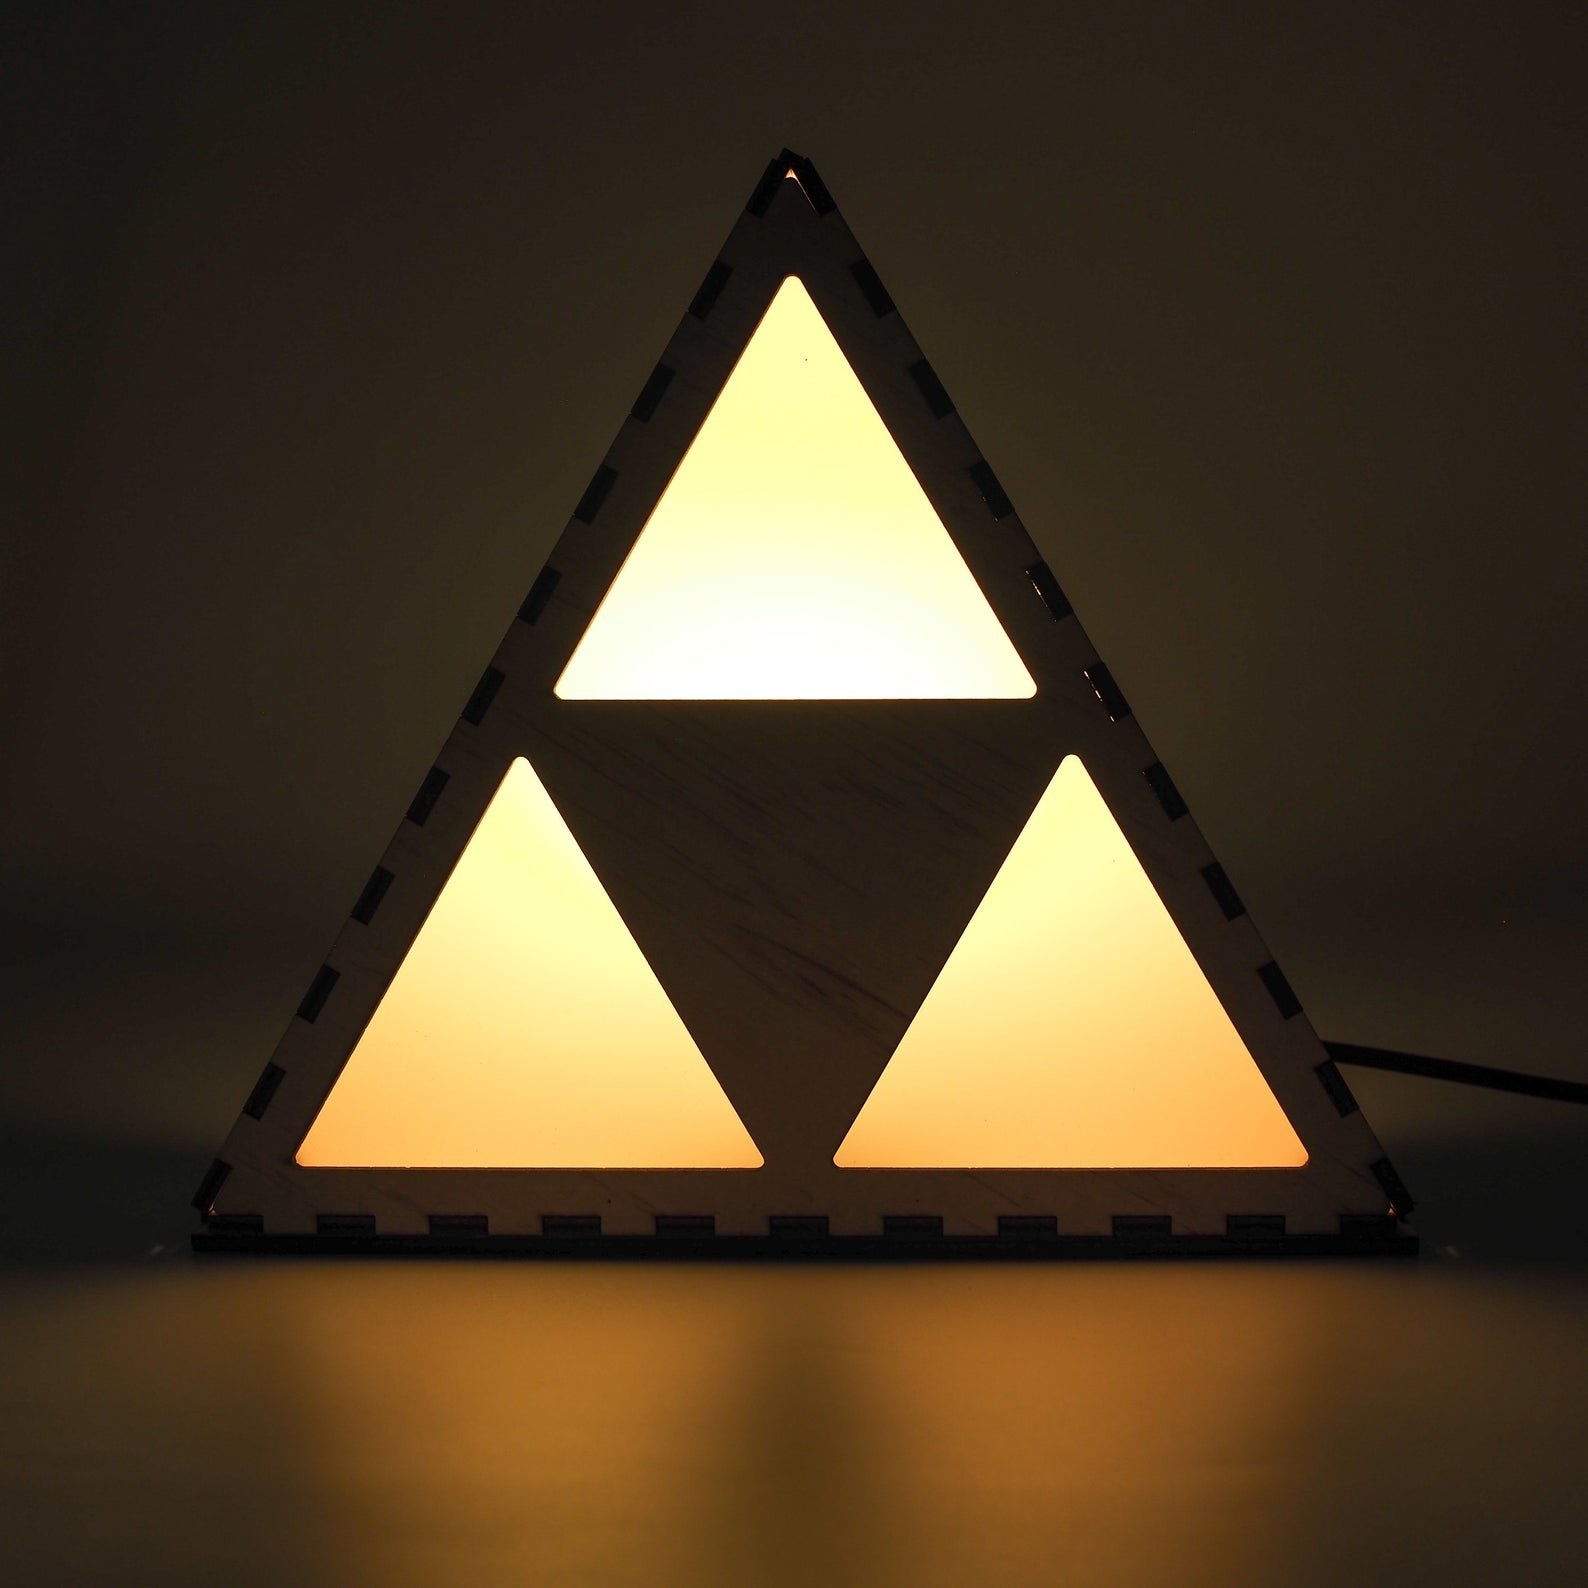 a light shaped like the triforce from zelda